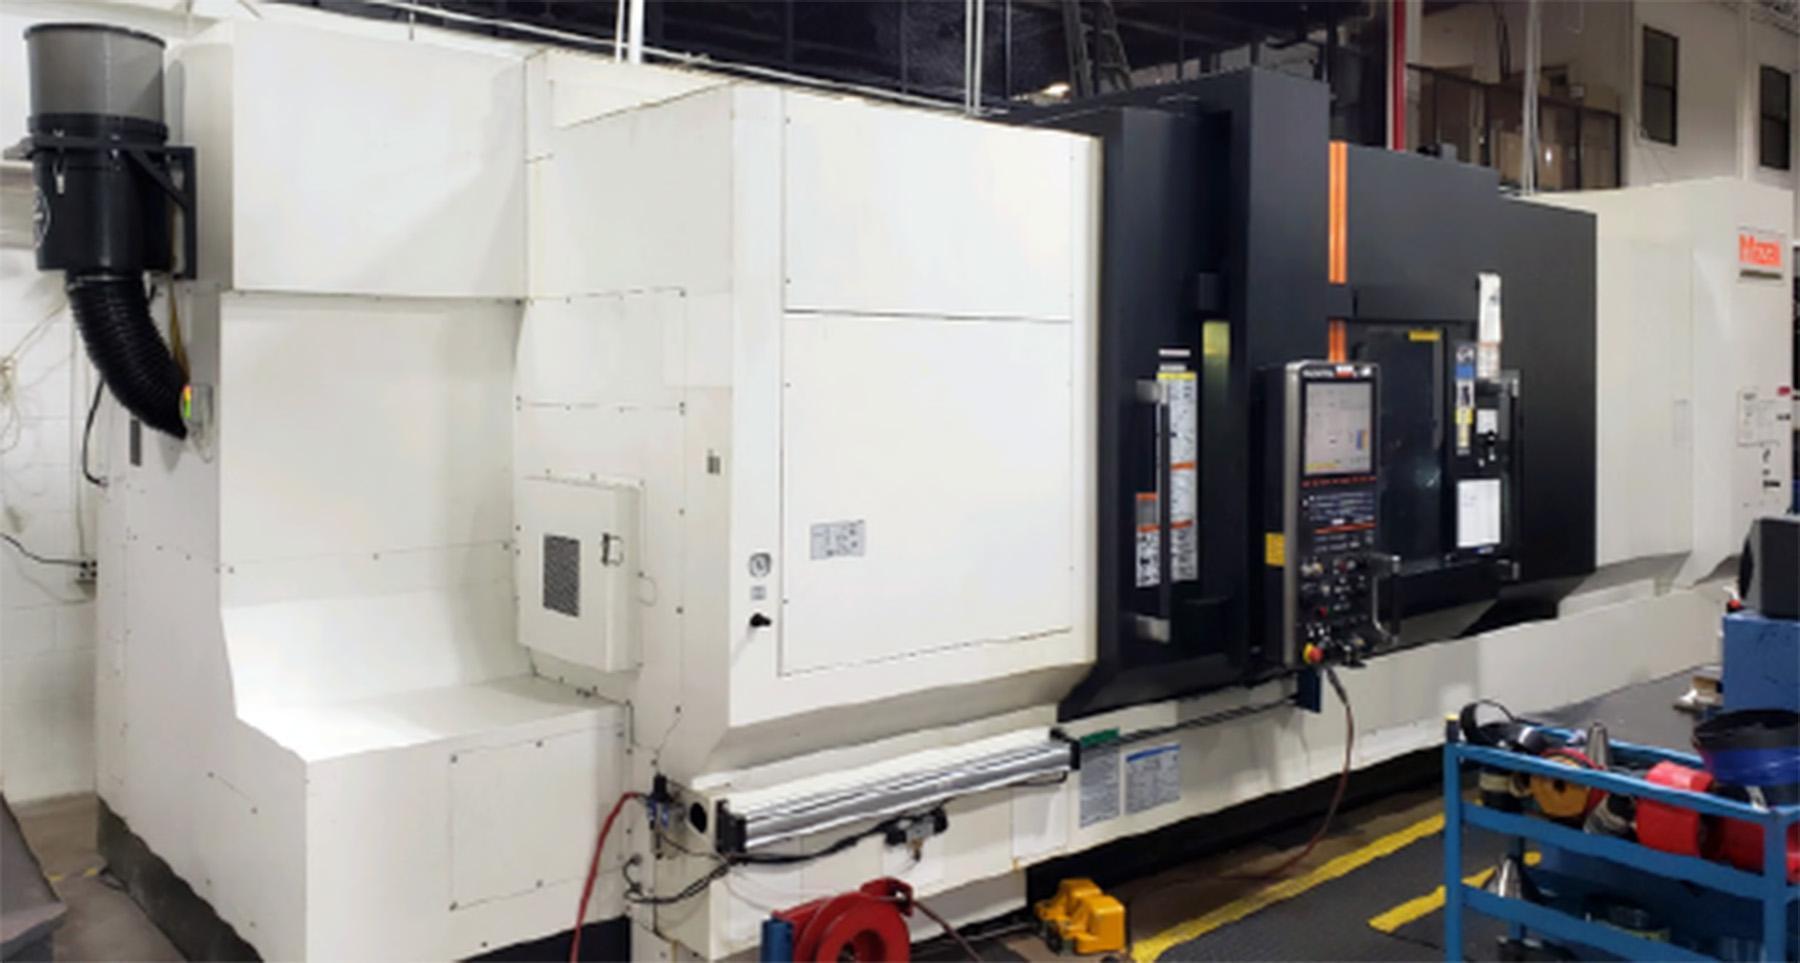 USED, MAZAK QTN 500-LBB CNC LATHE